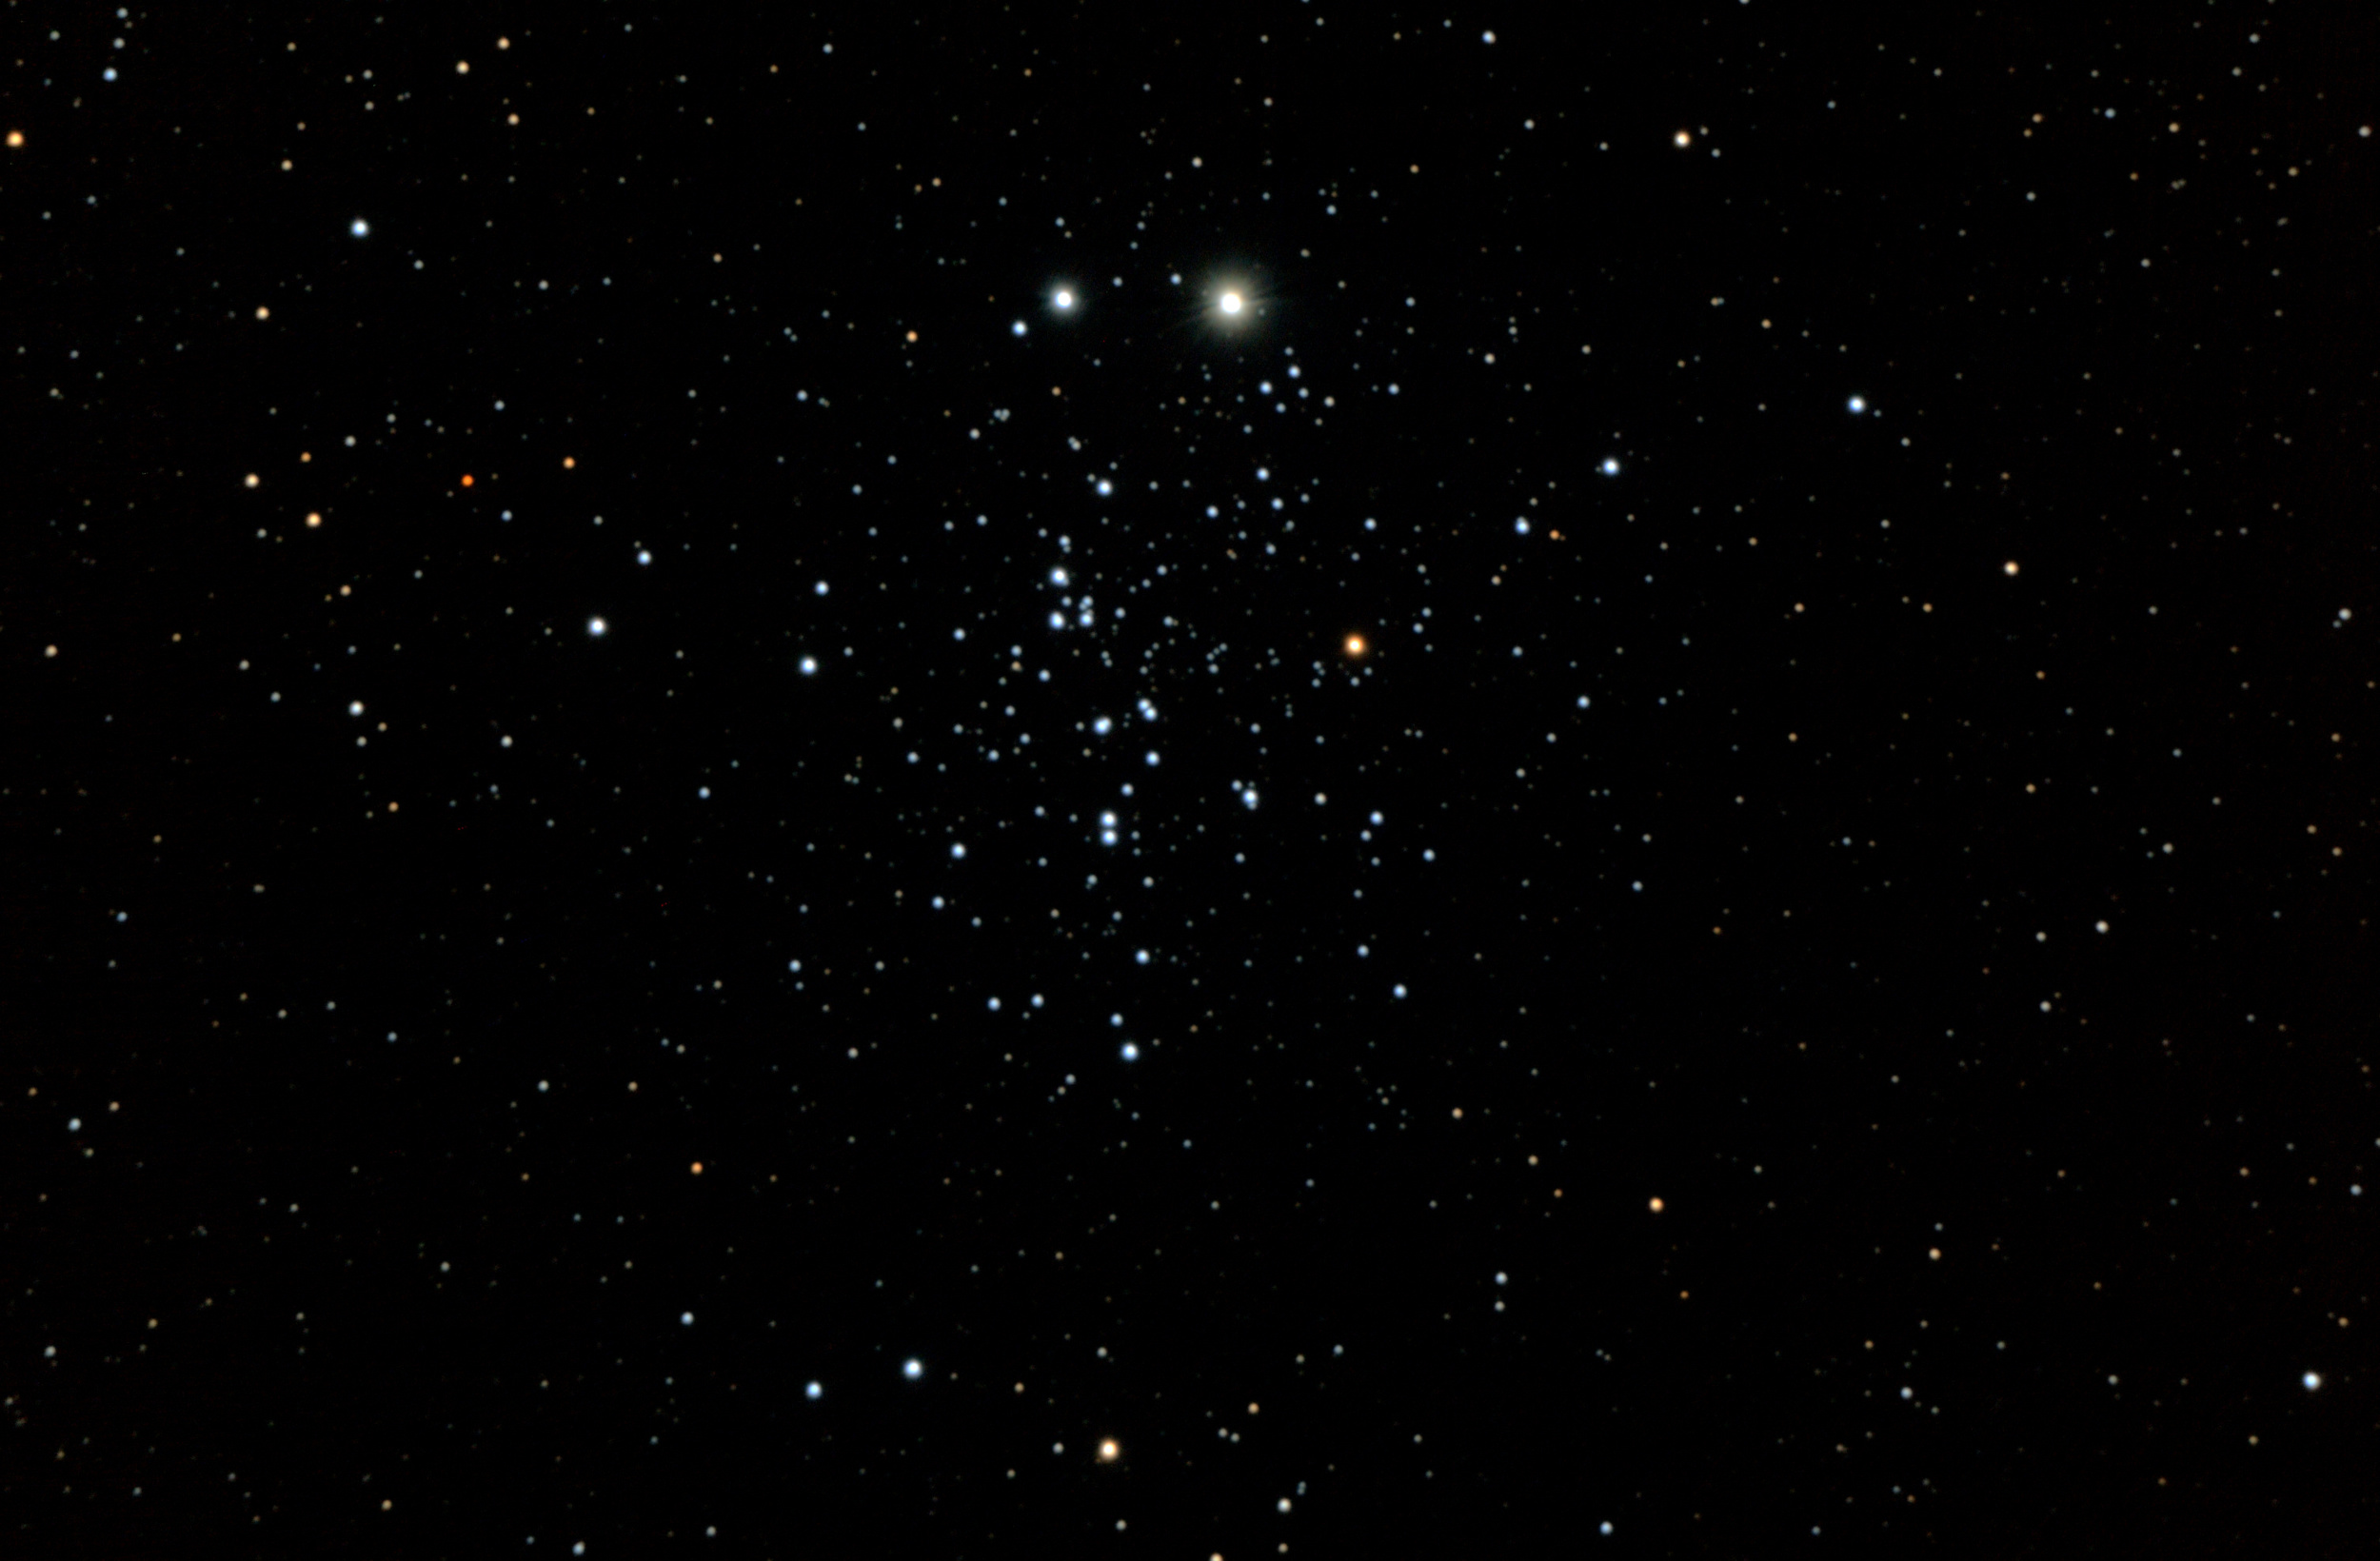 Owl/ET Cluster (NGC 457)